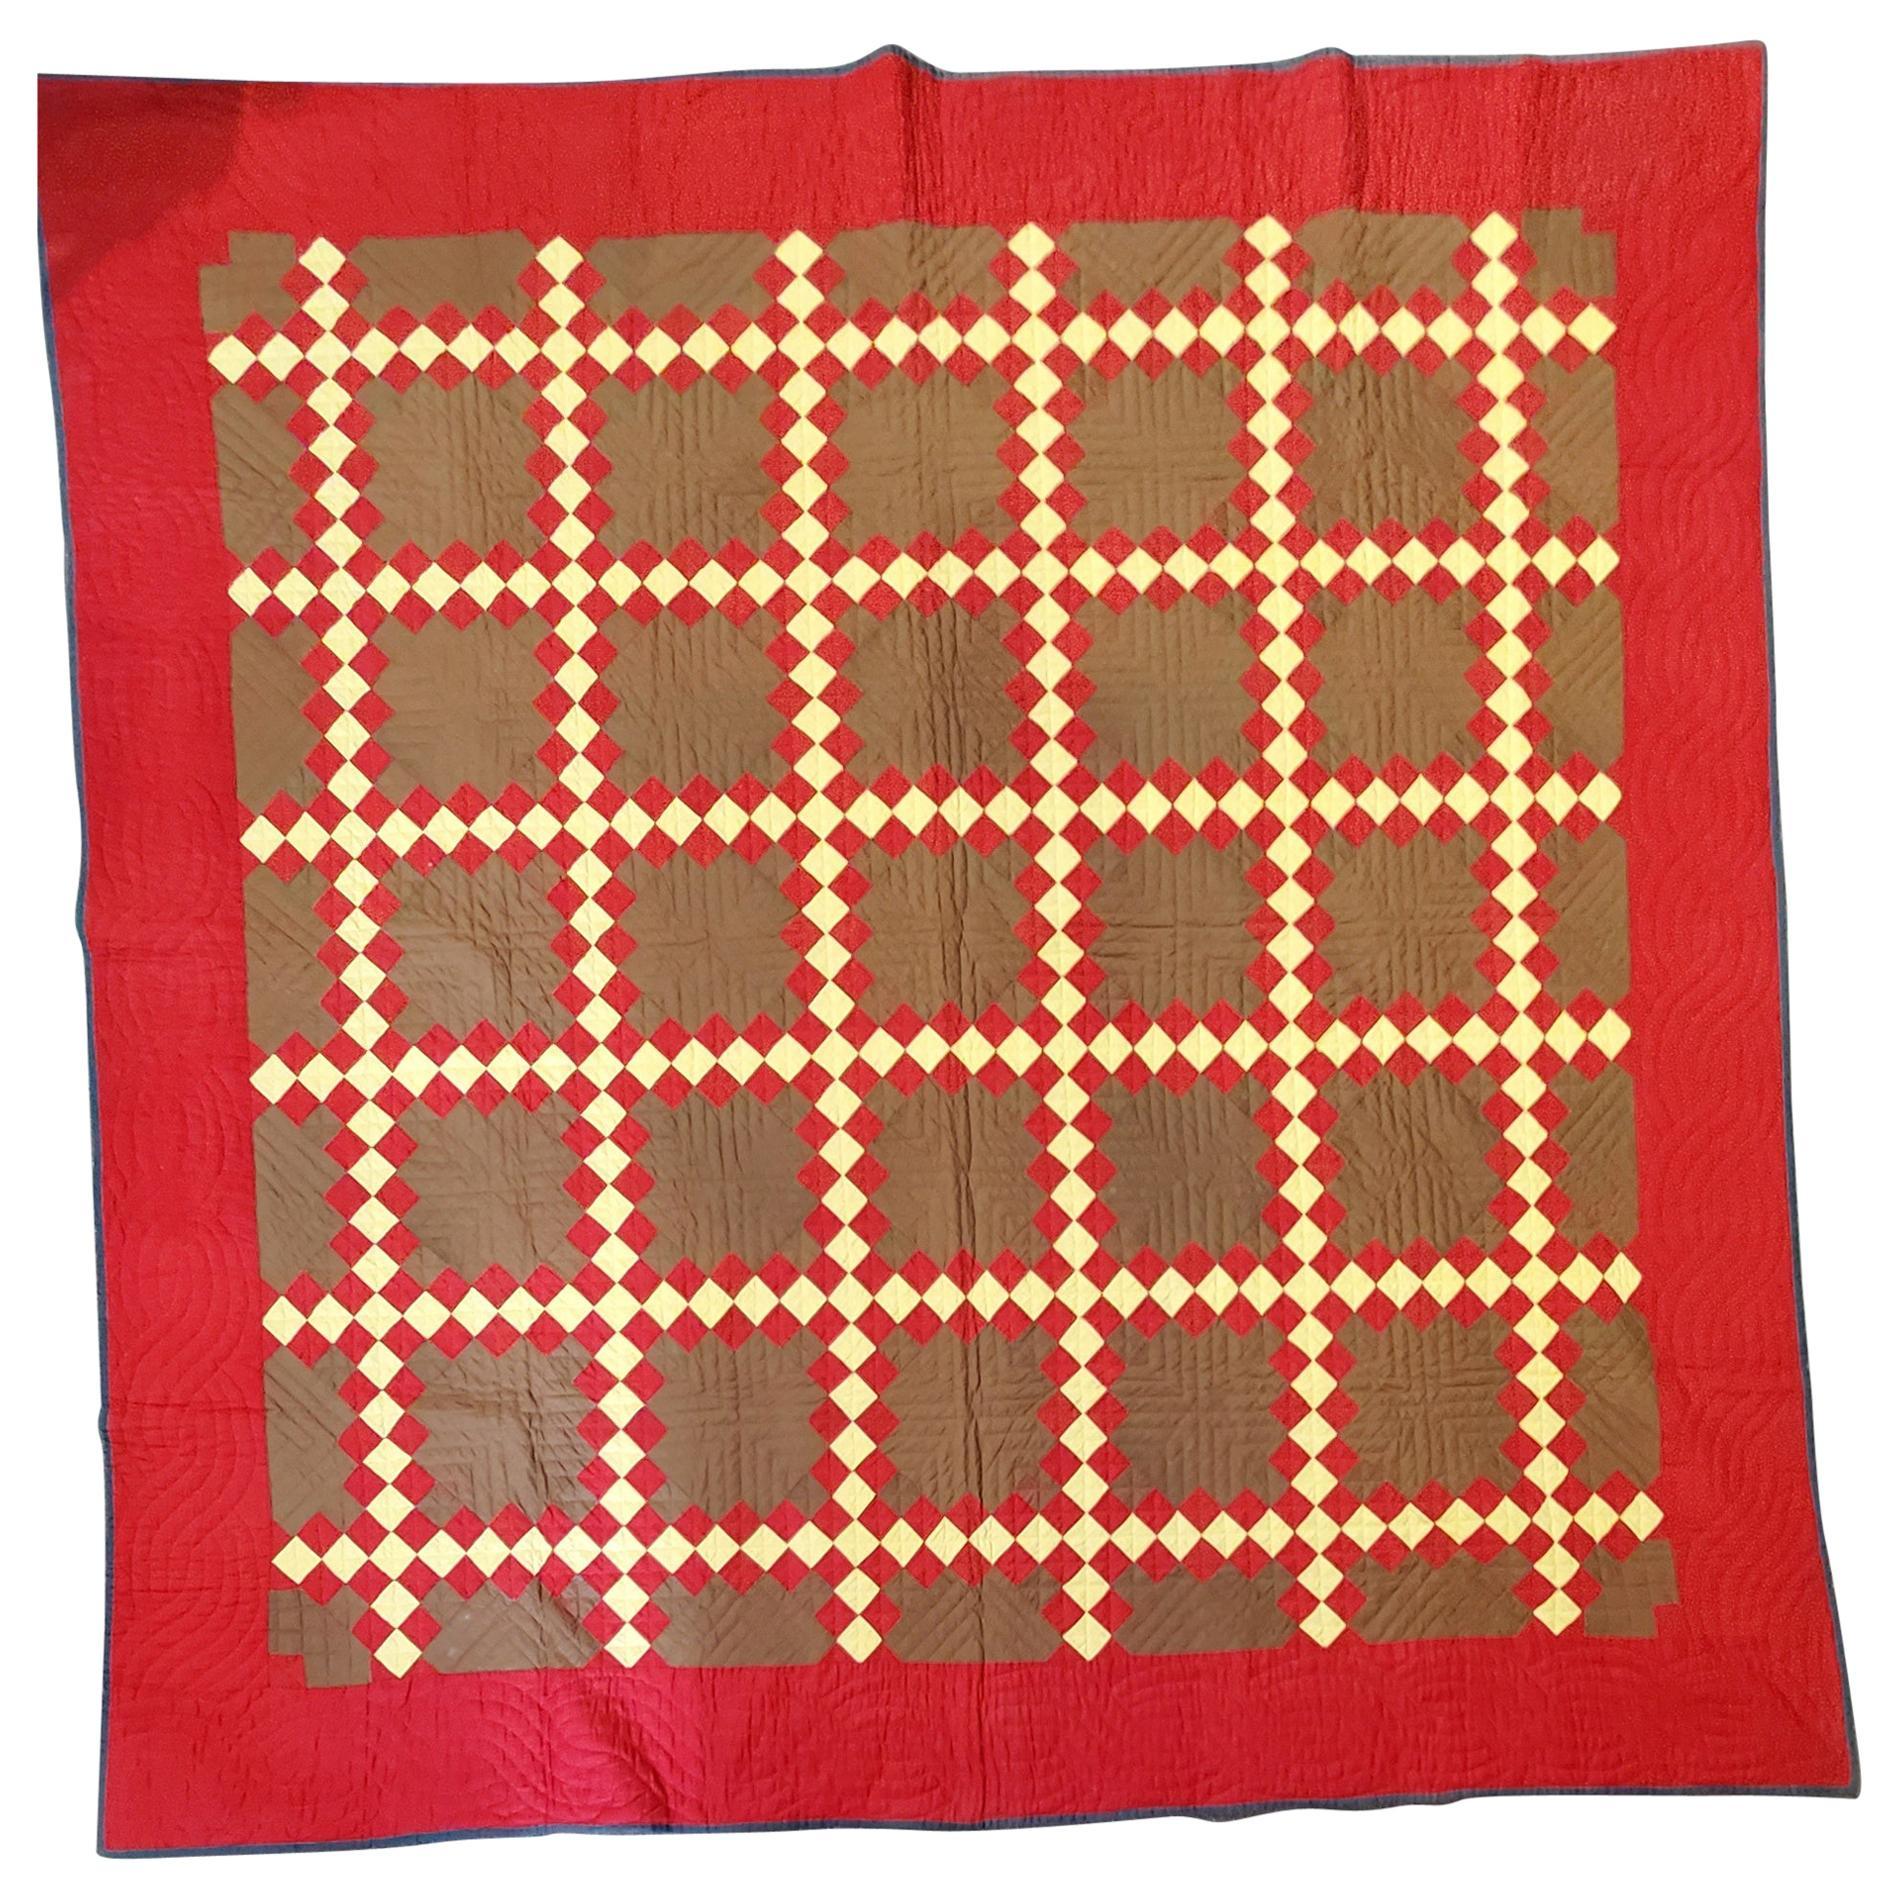 19thc Triple Irish Chain Quilt from Pennsylvania